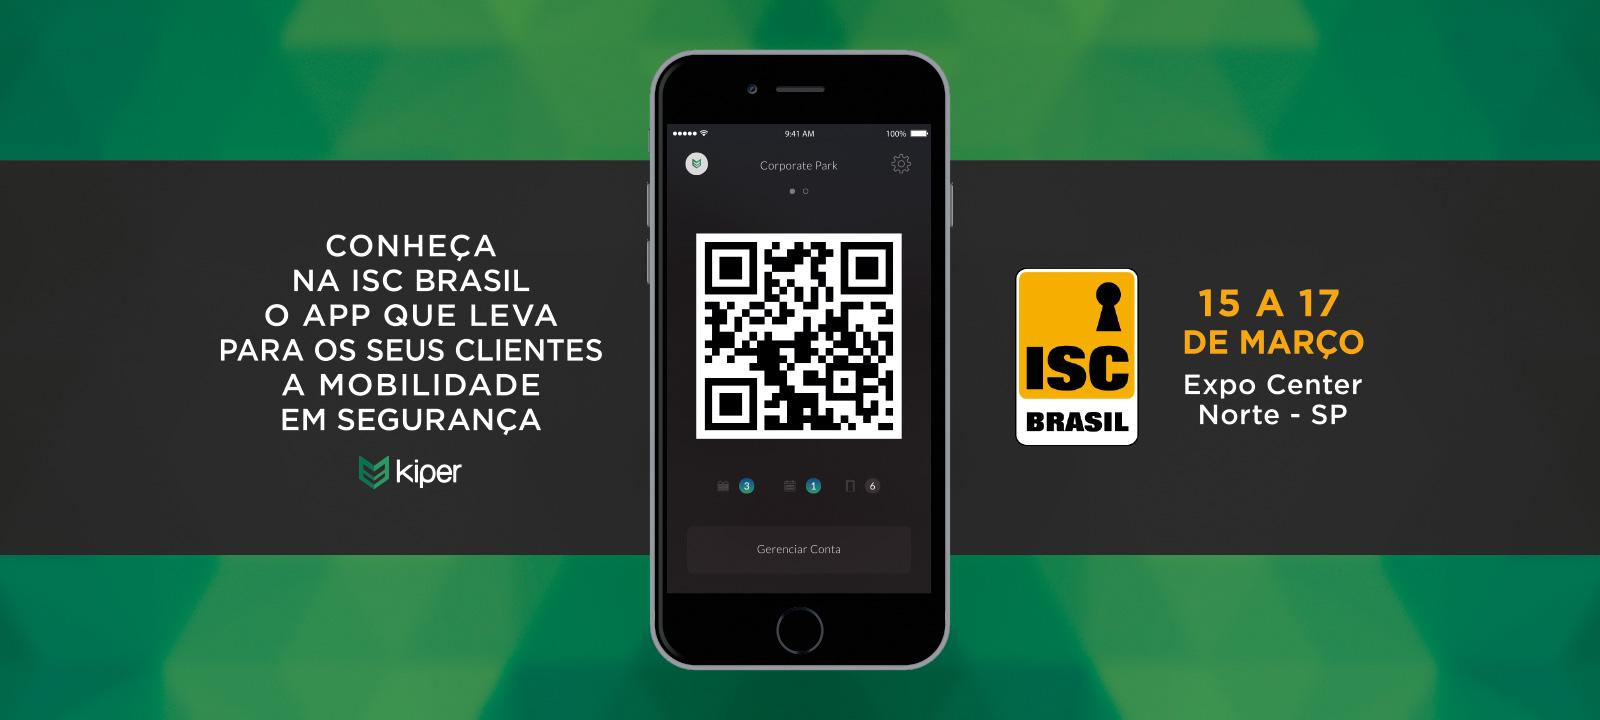 Kiper lança aplicativo na ISC 2016